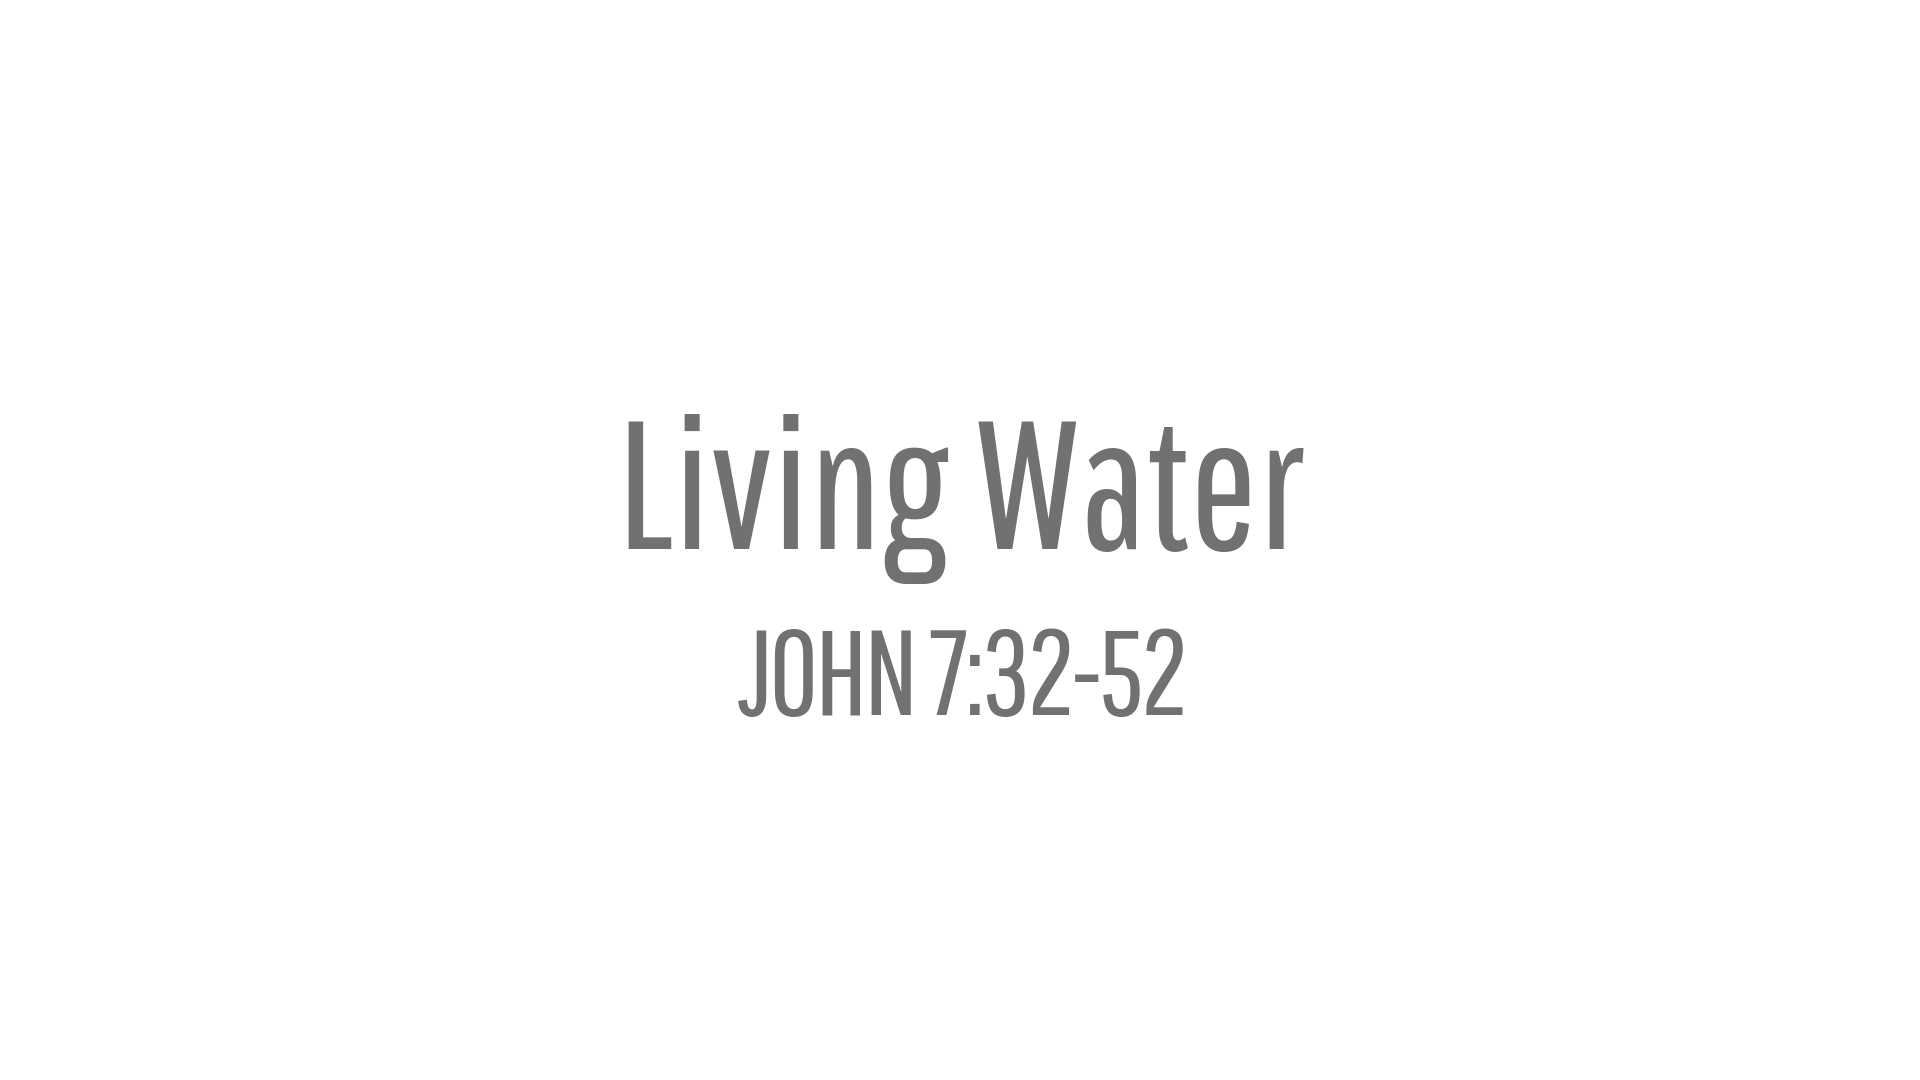 I Am Living Water.jpg